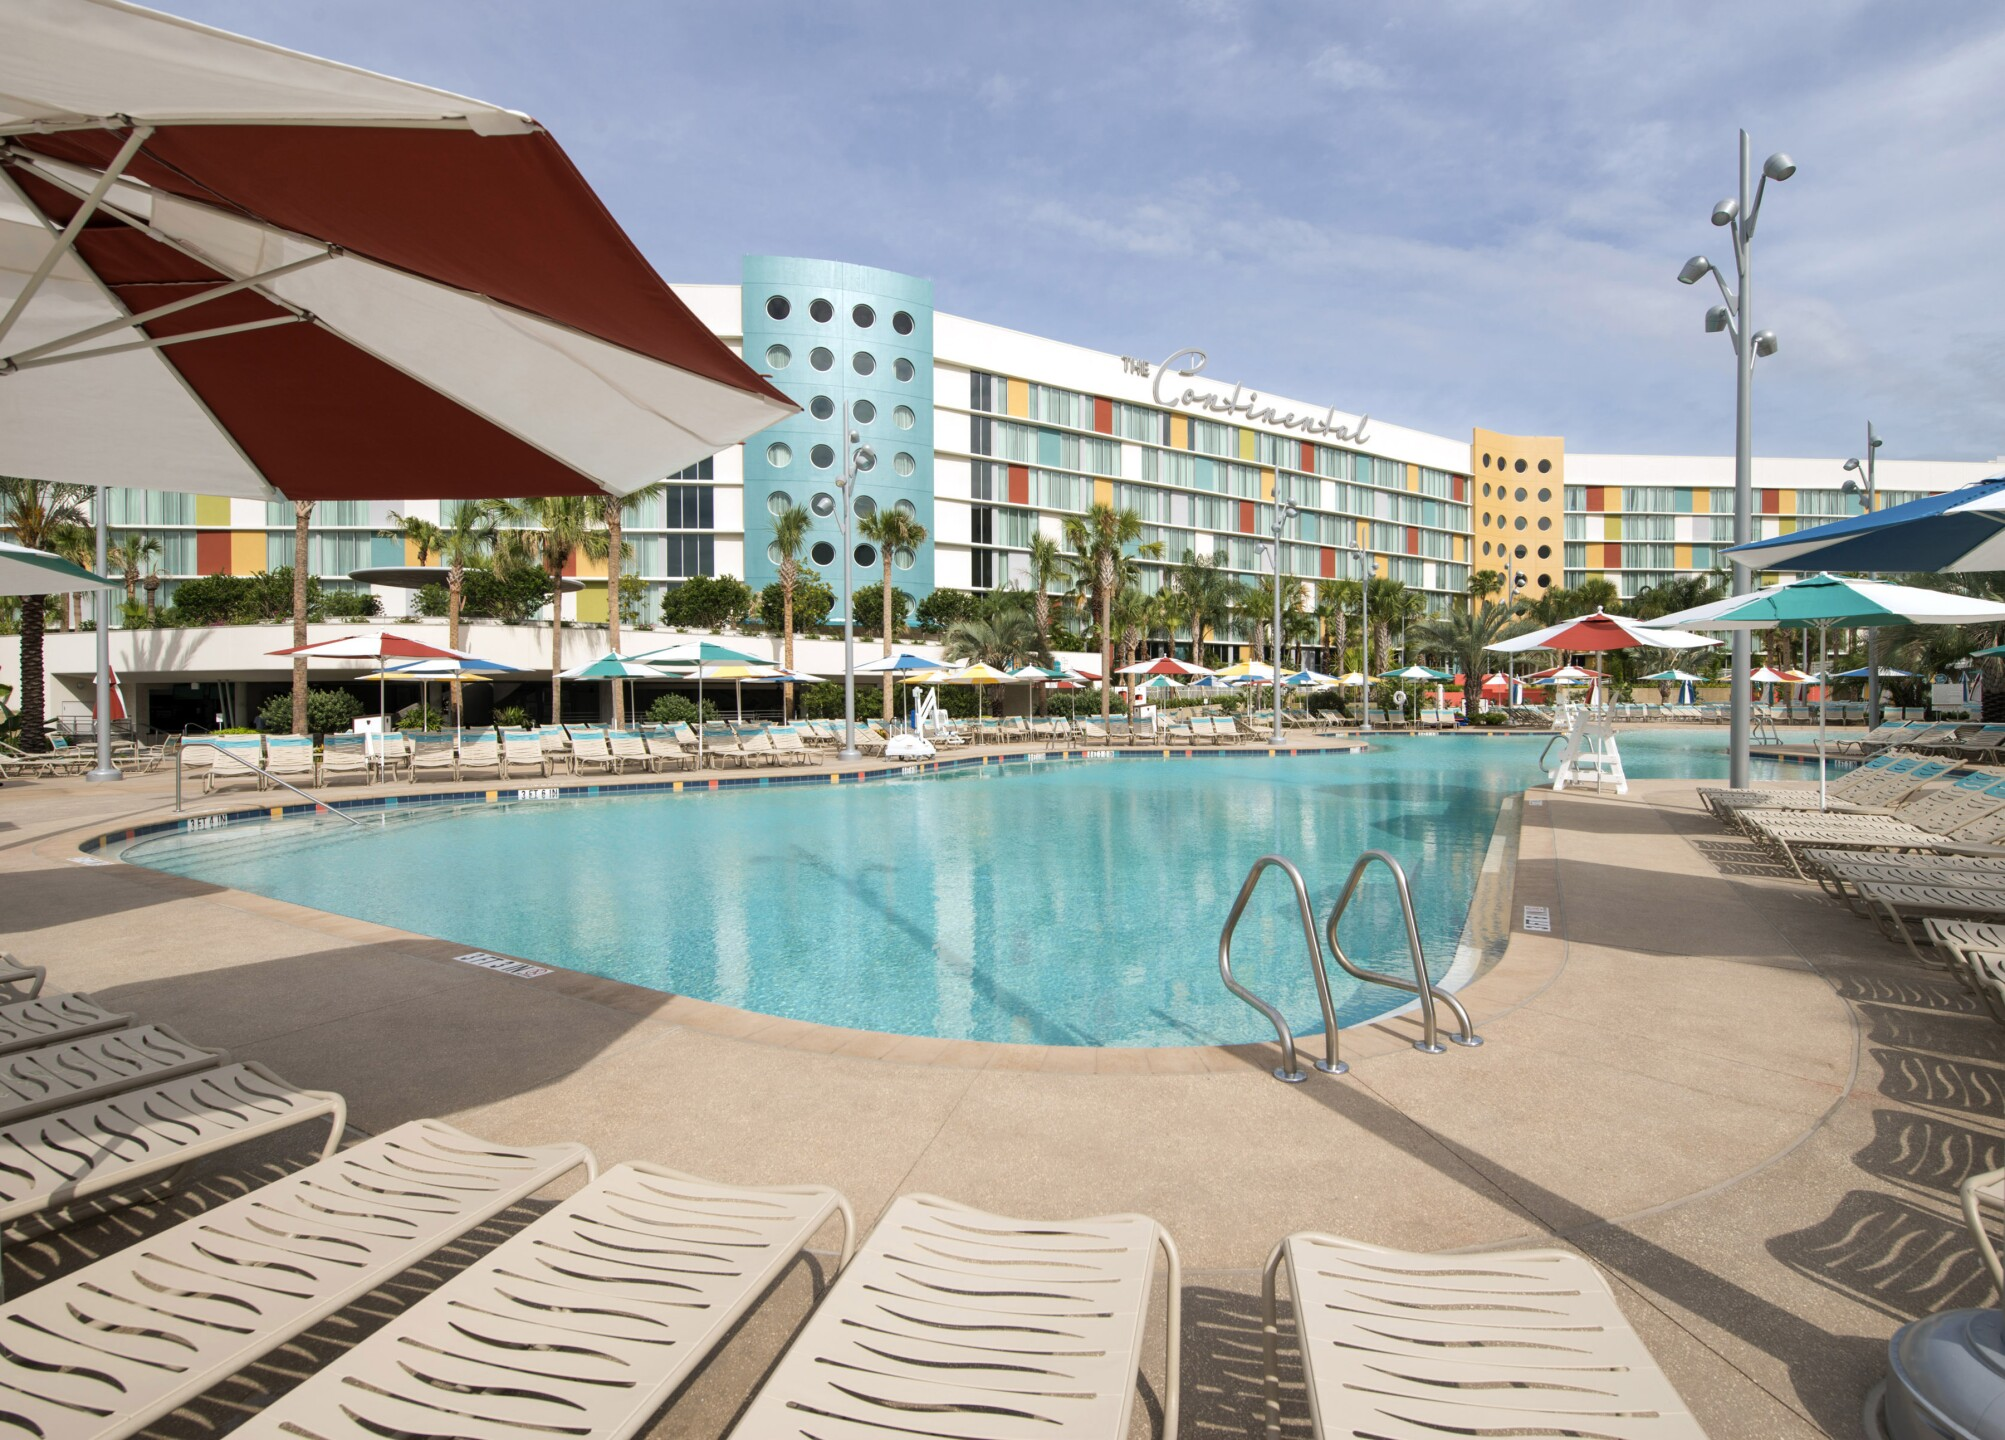 Pool in Orlando, FL